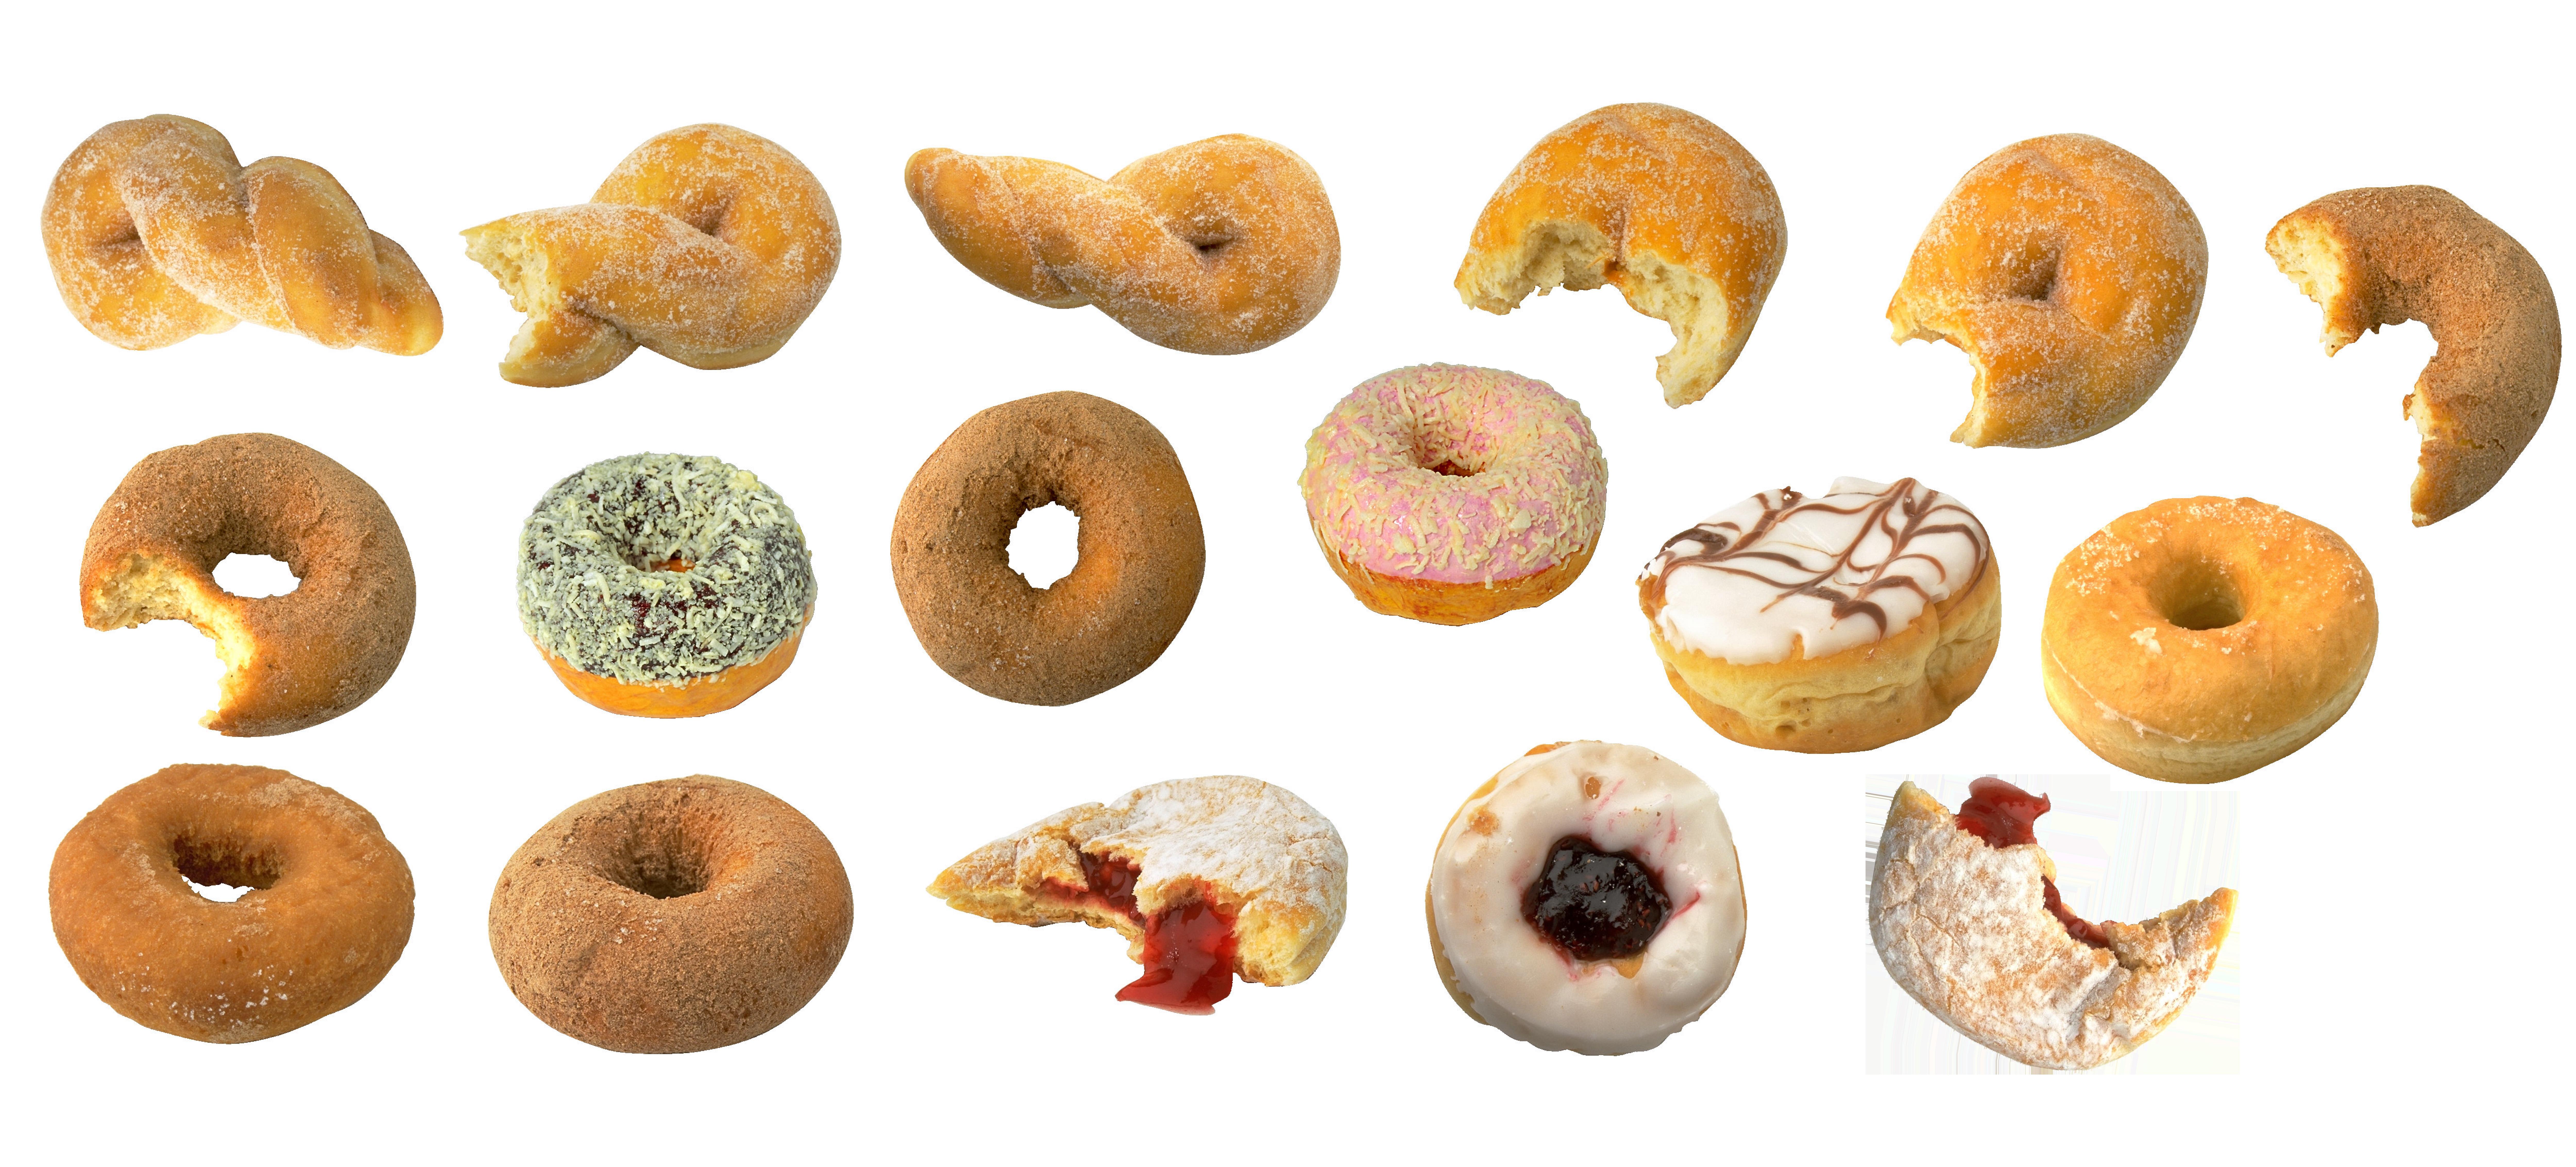 free download Vector donut bagel. Cider doughnut cannabis variety